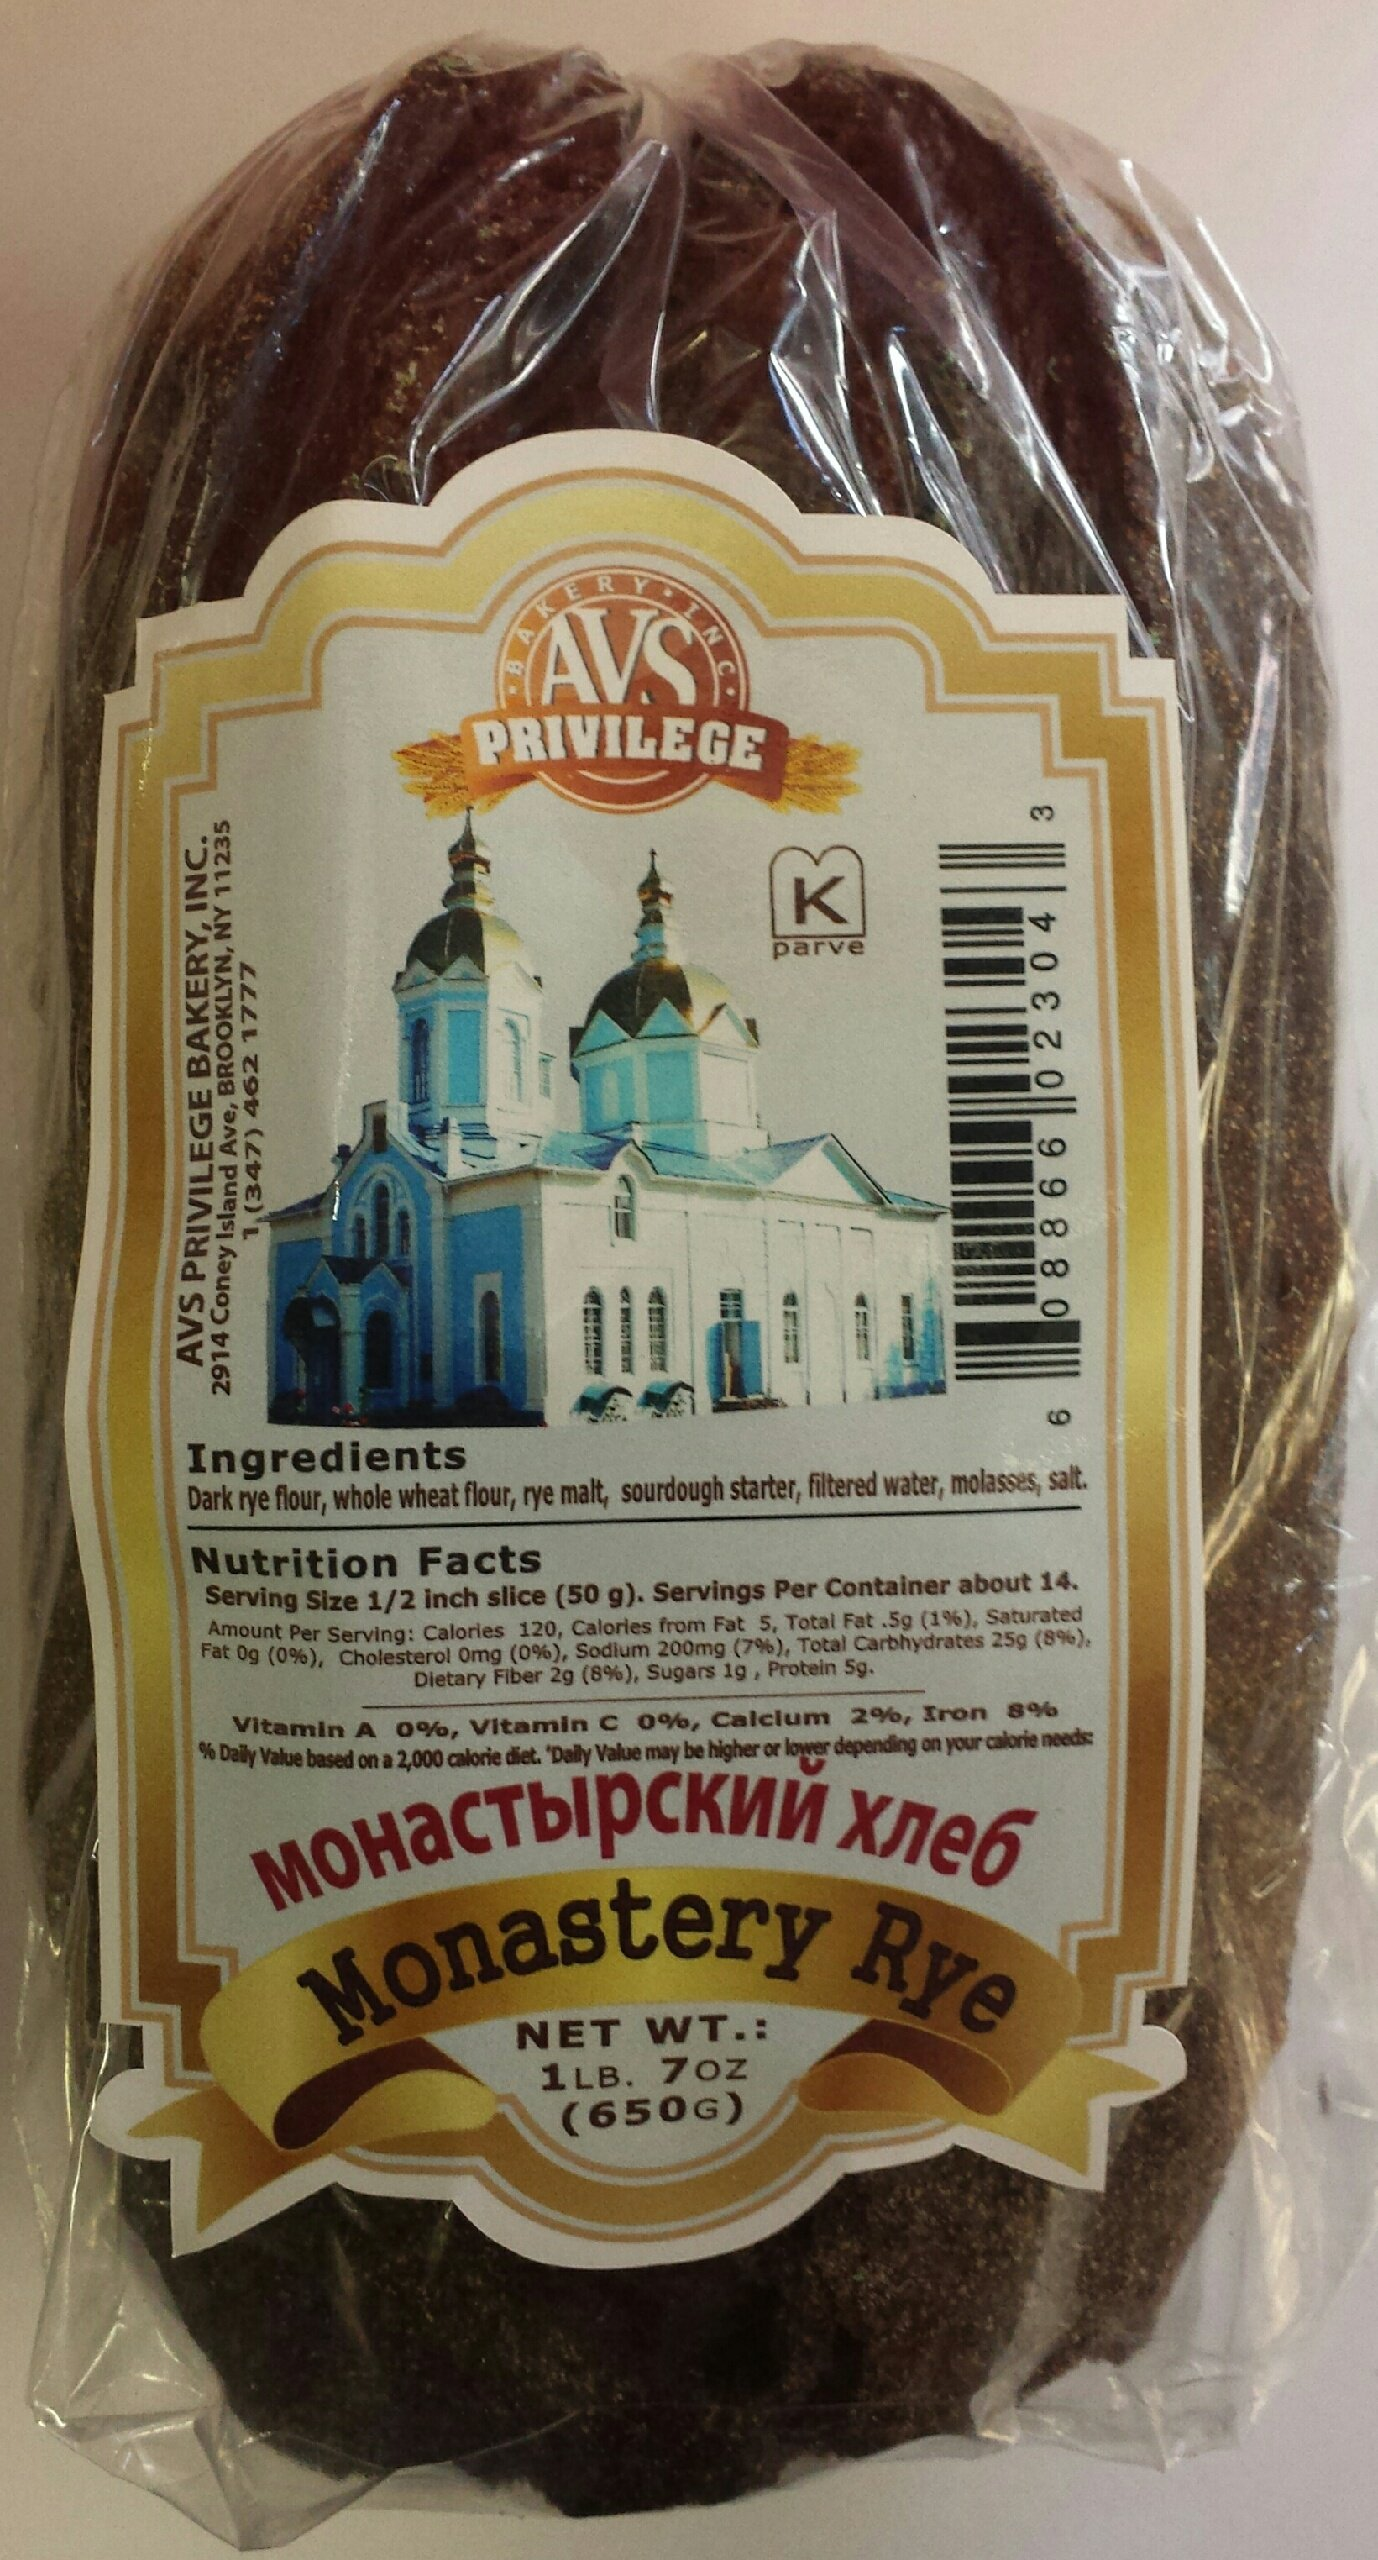 European Monastery Rye Bread (Sourdough) Pack of 2